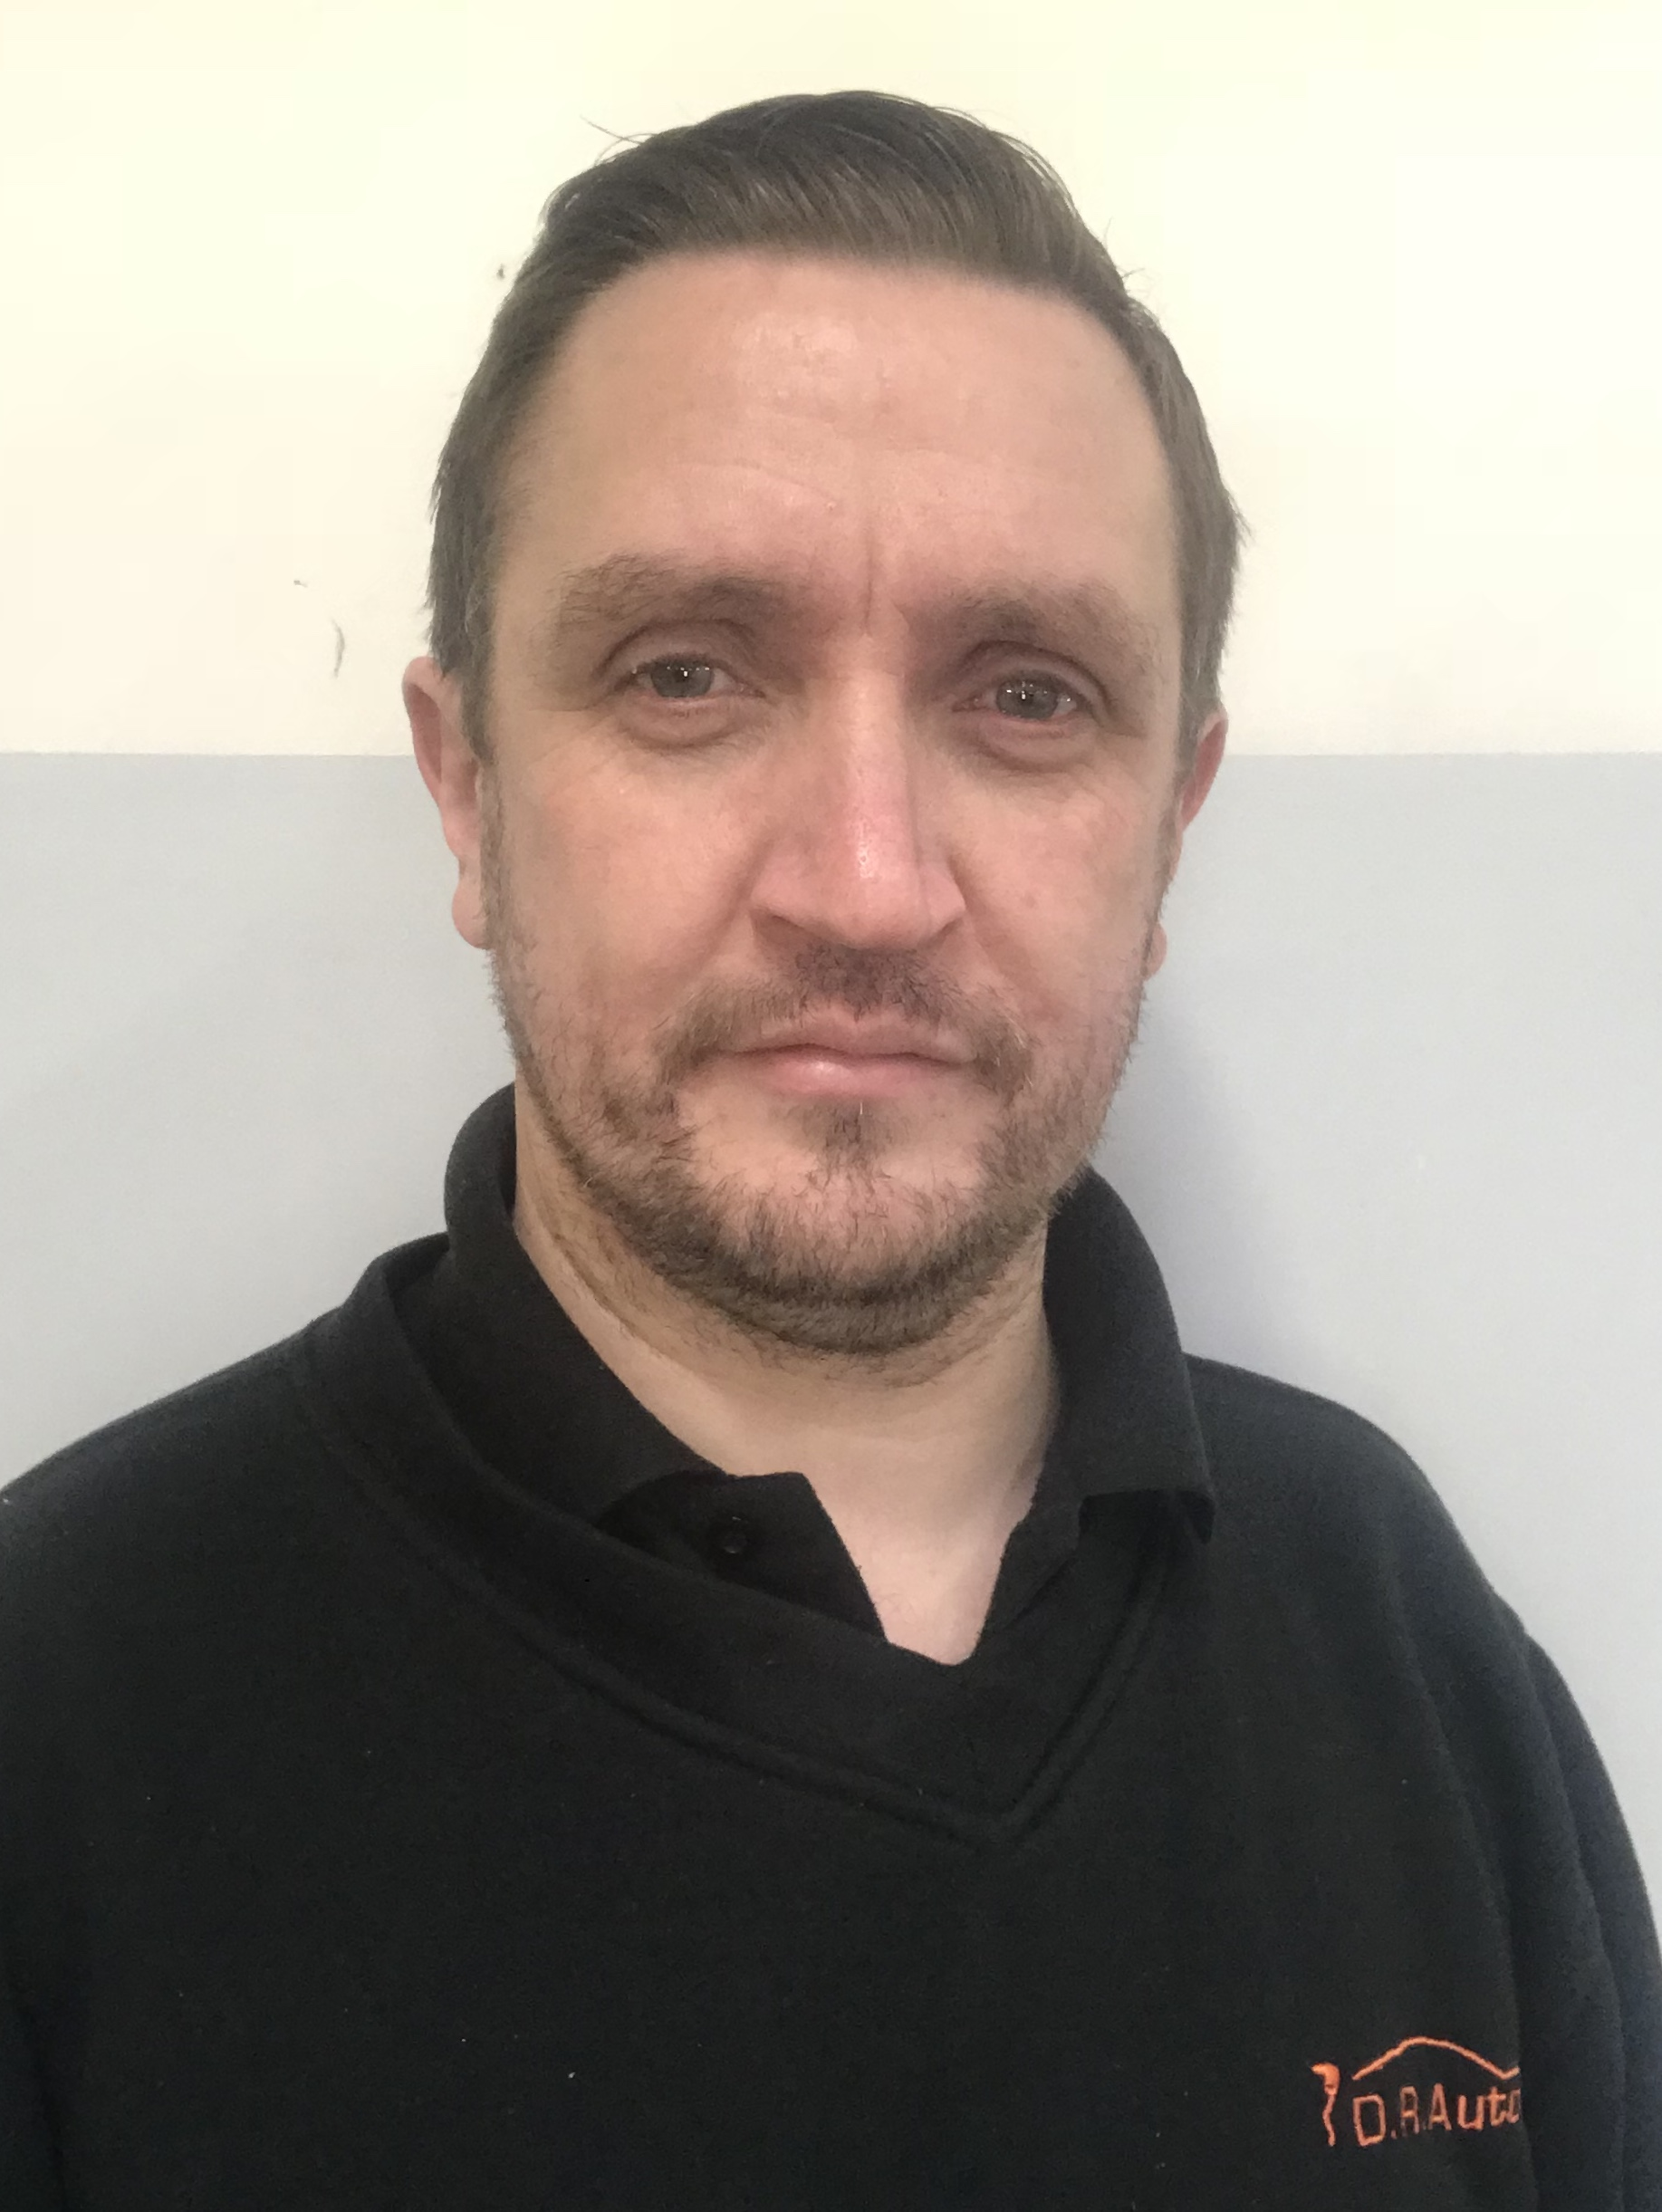 Dave O'Brien - Owner, Technician